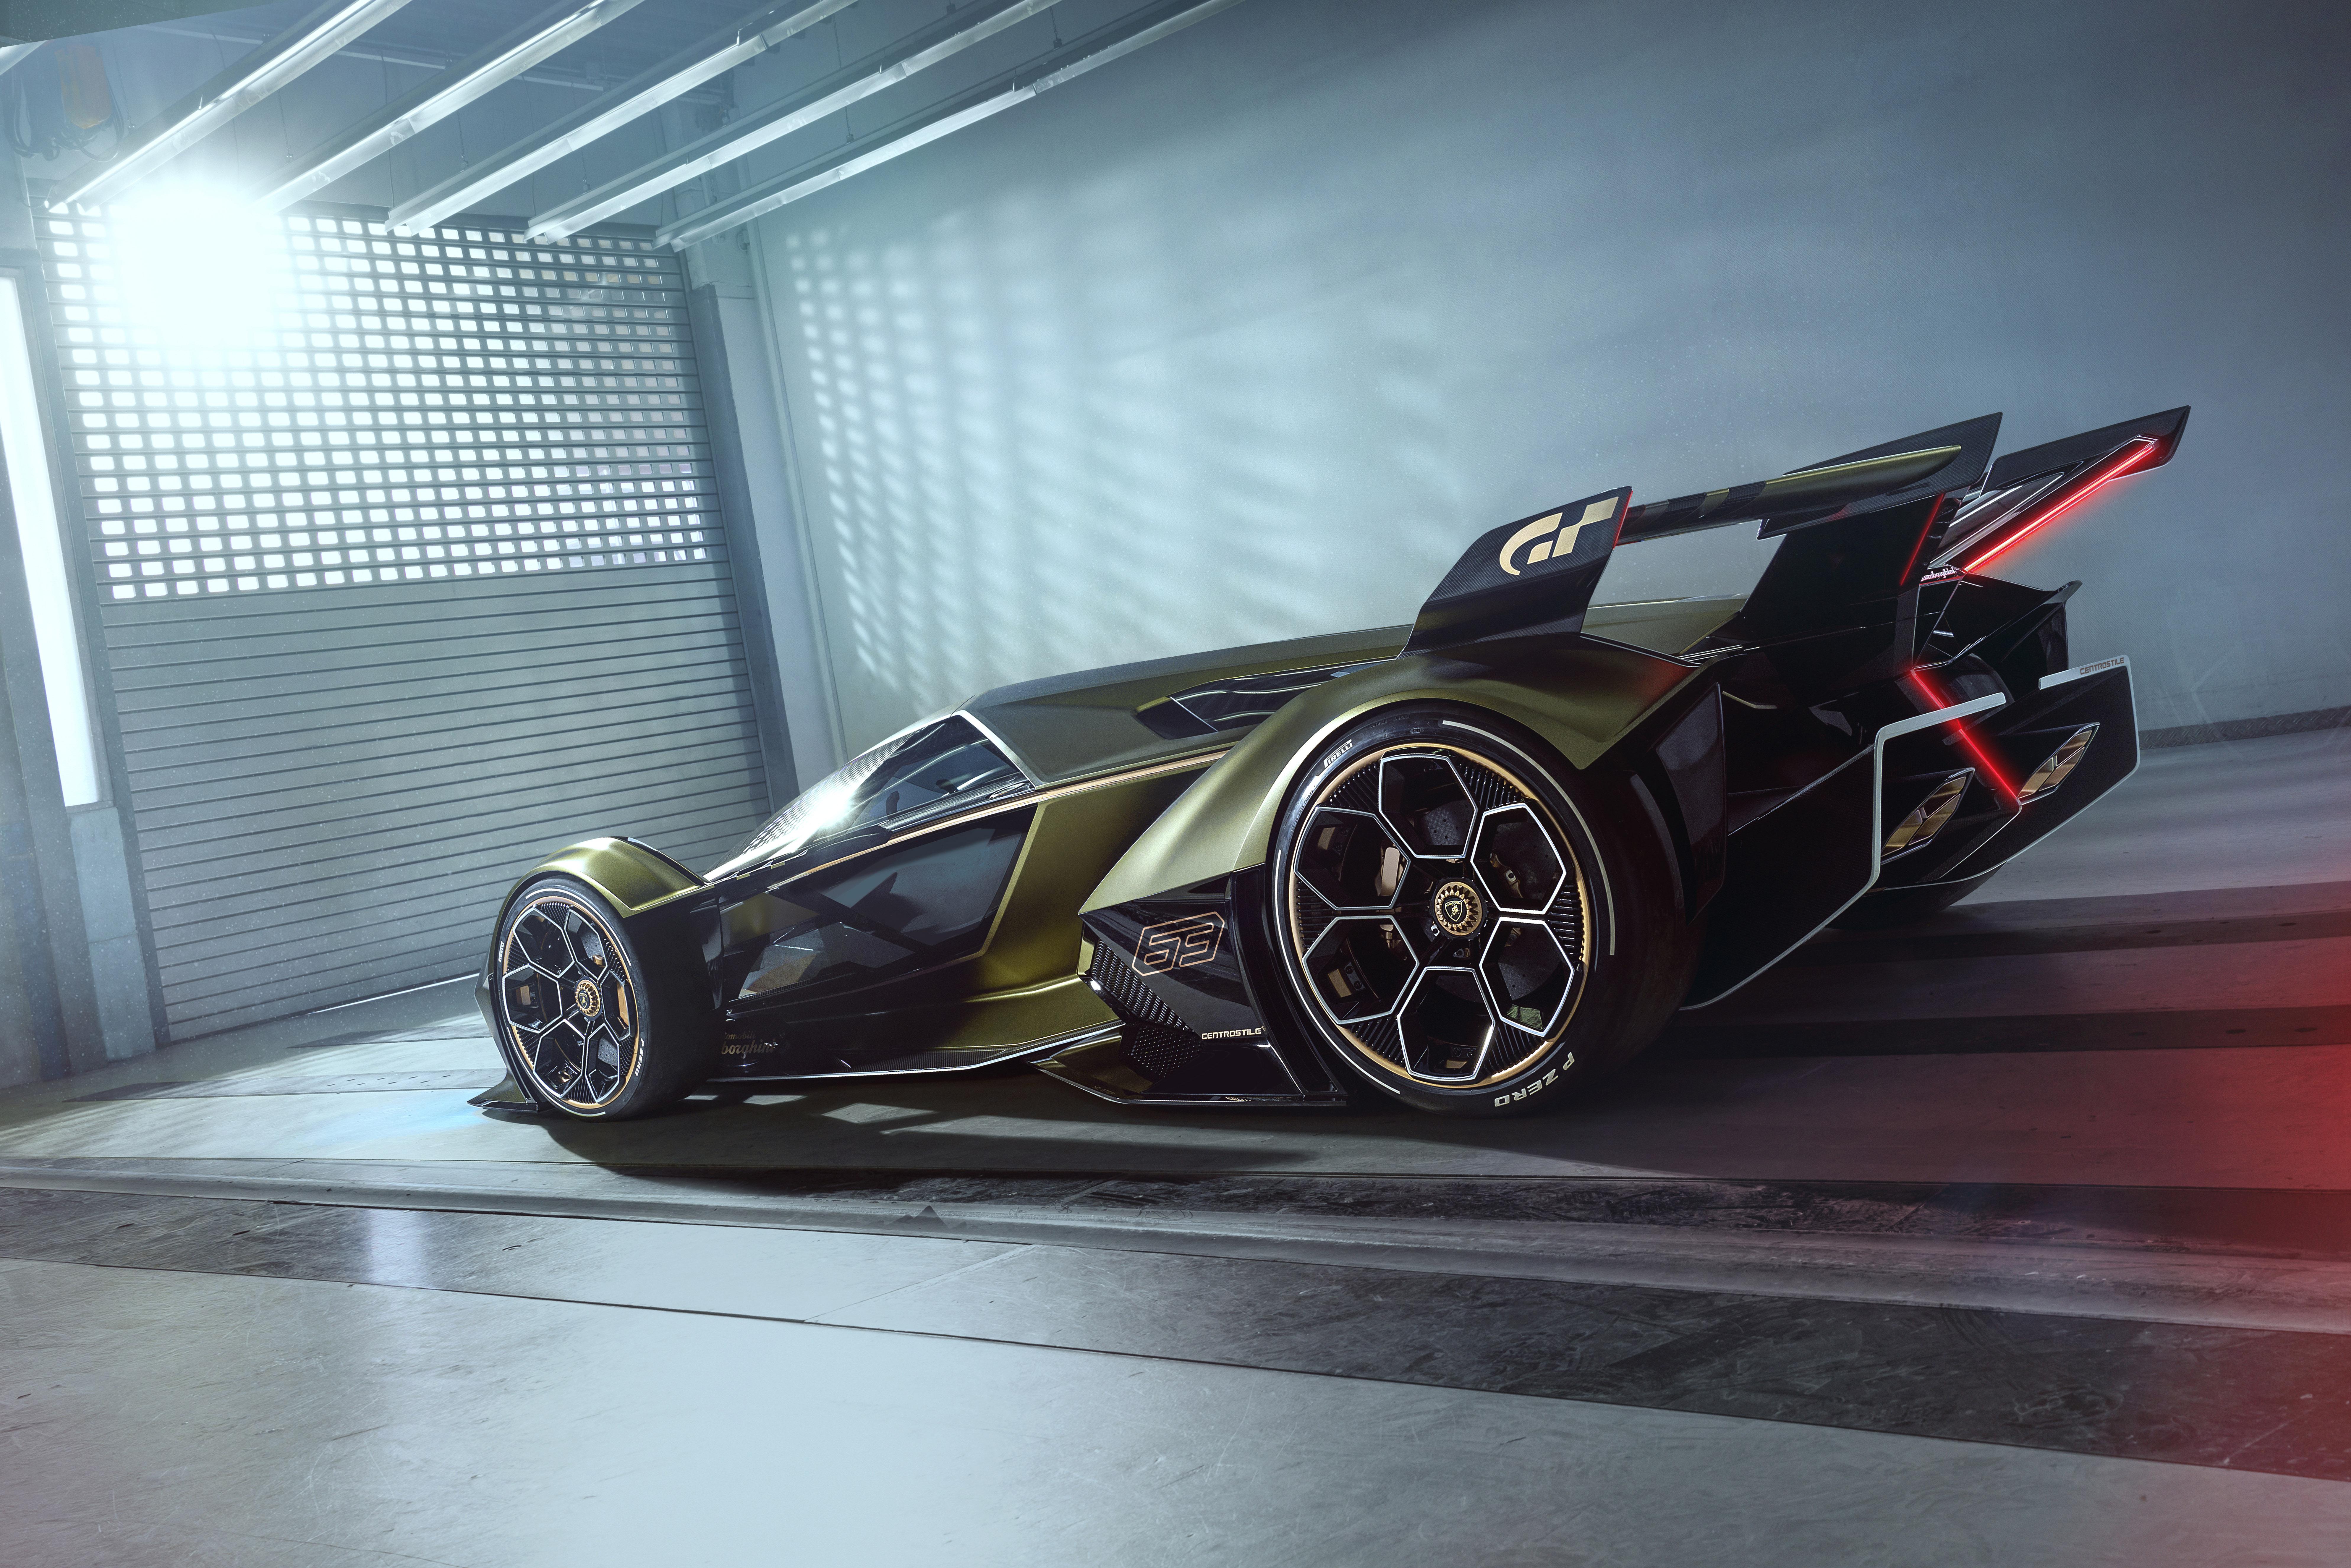 2020 Lamborghini Lambo V12 Vision Gran Turismo Side View ...